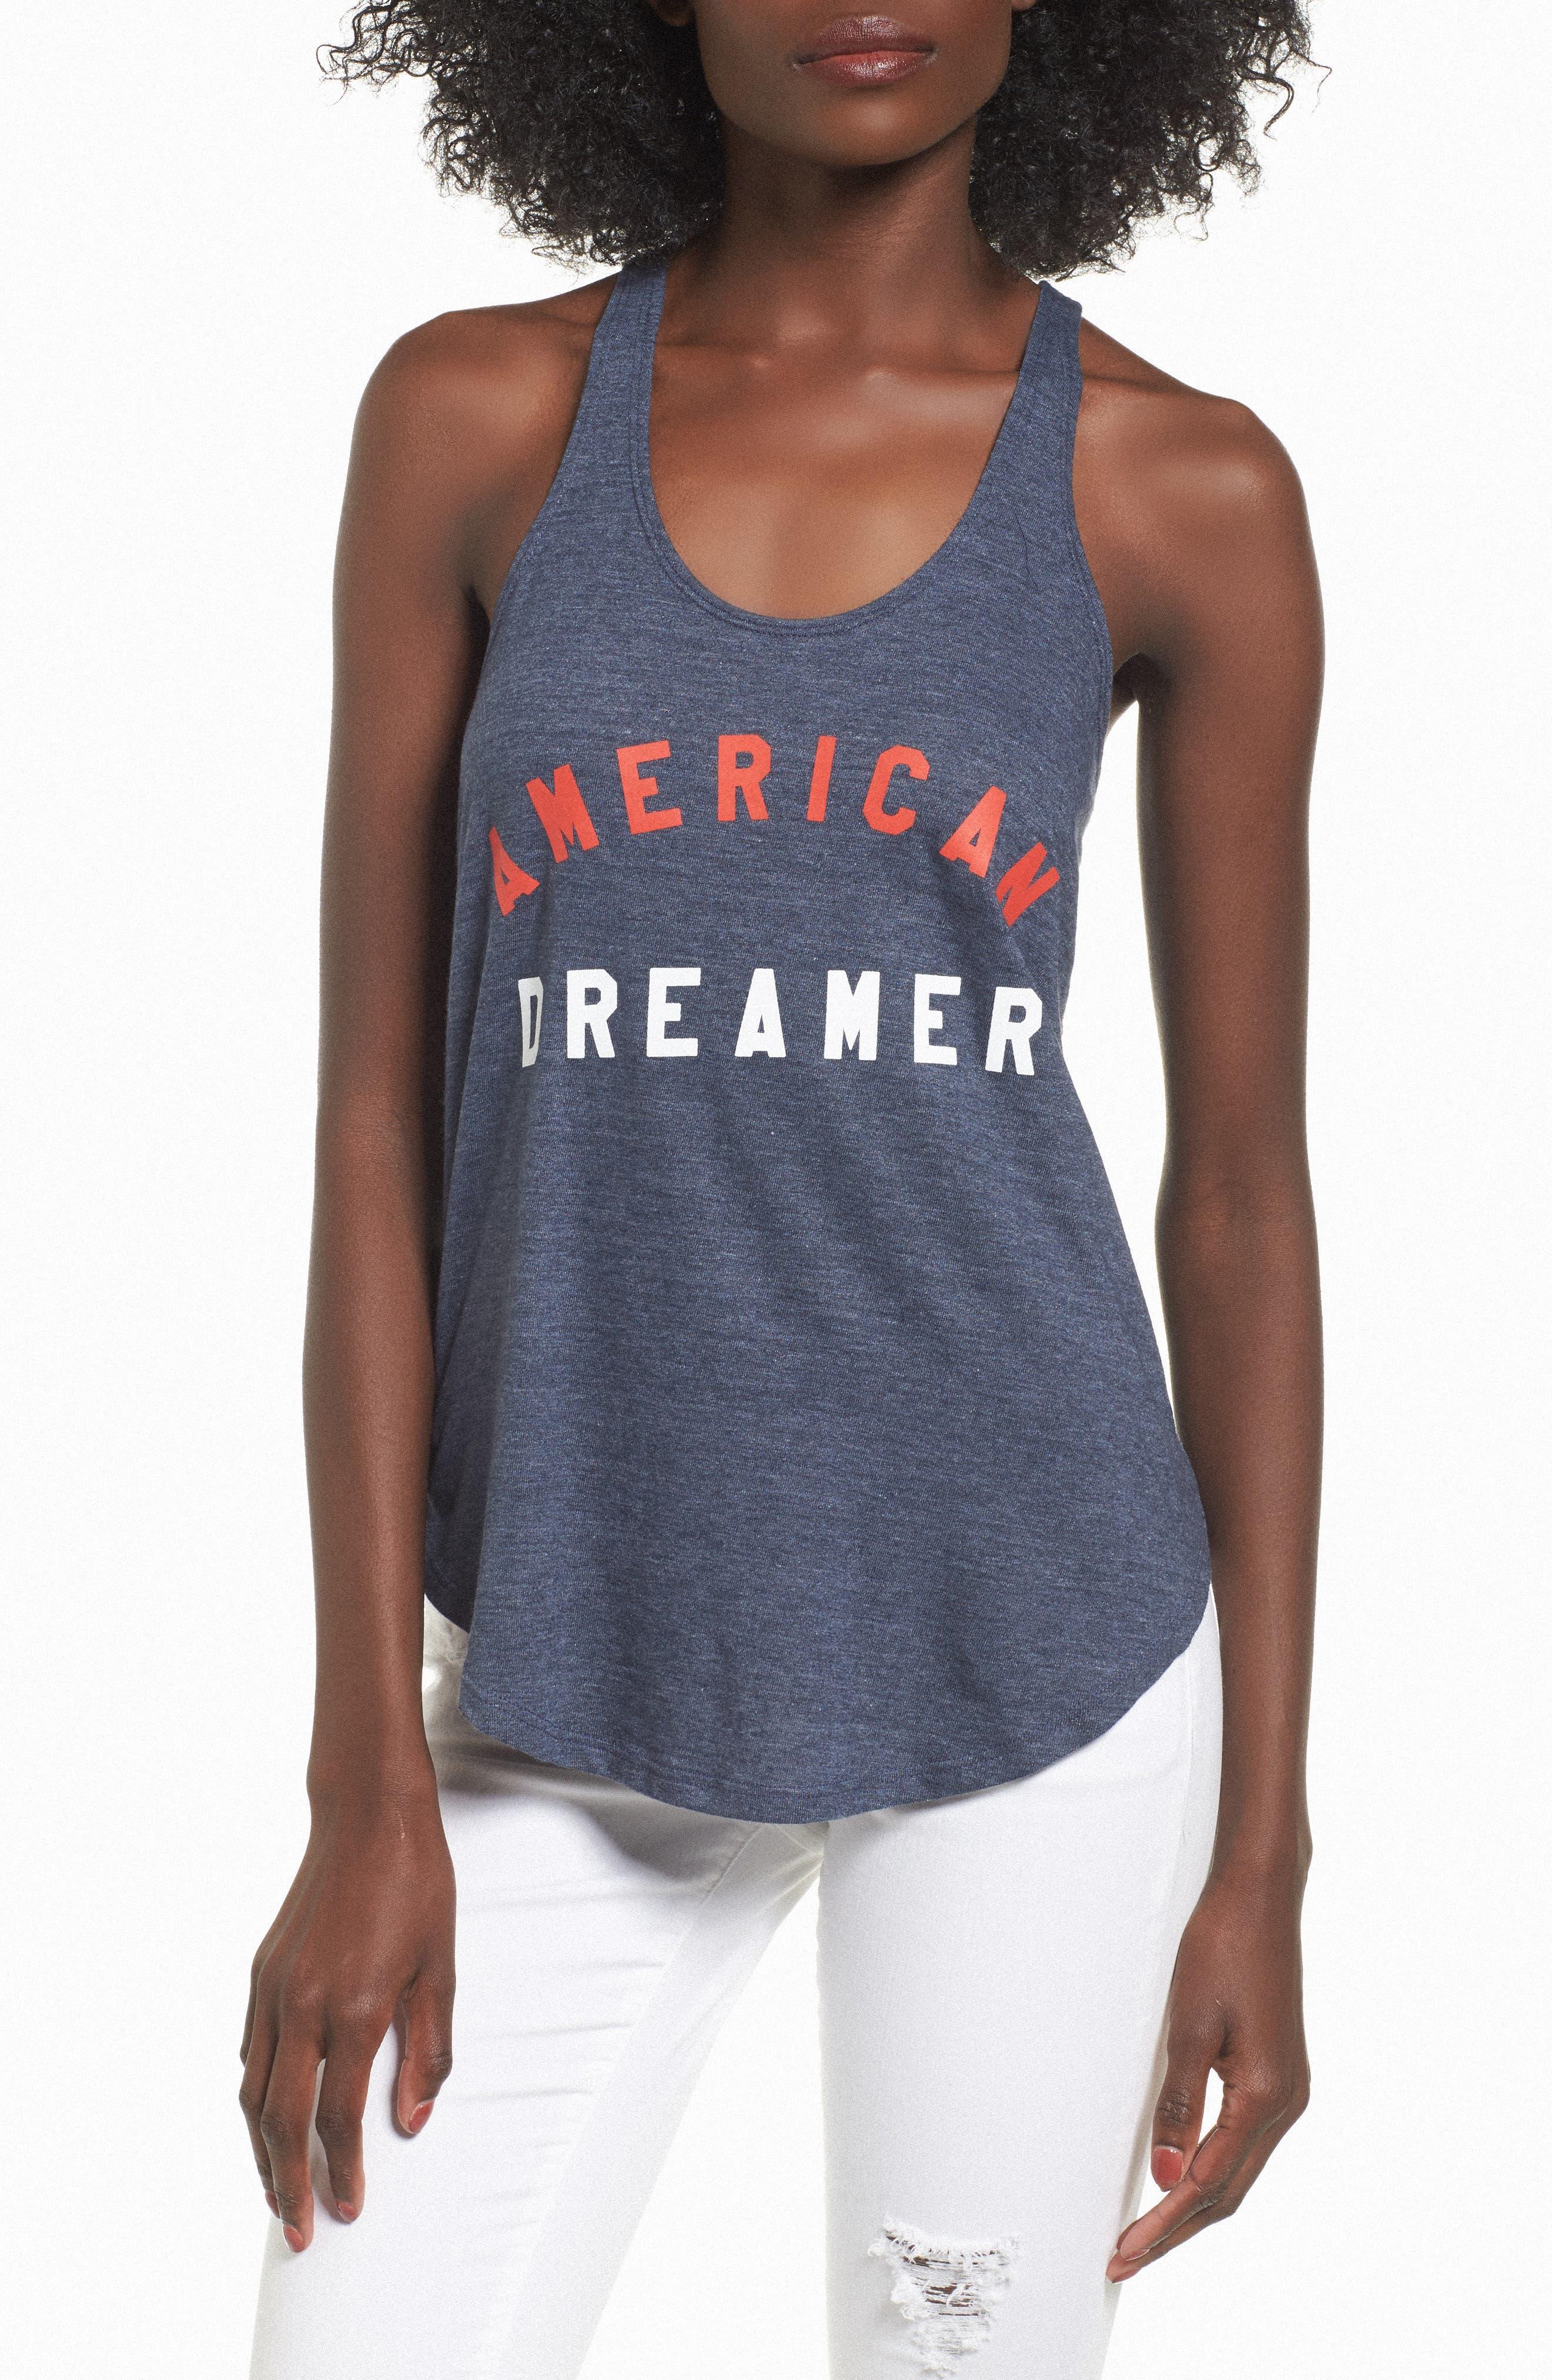 Sub_Urban Riot American Dreamer Tank